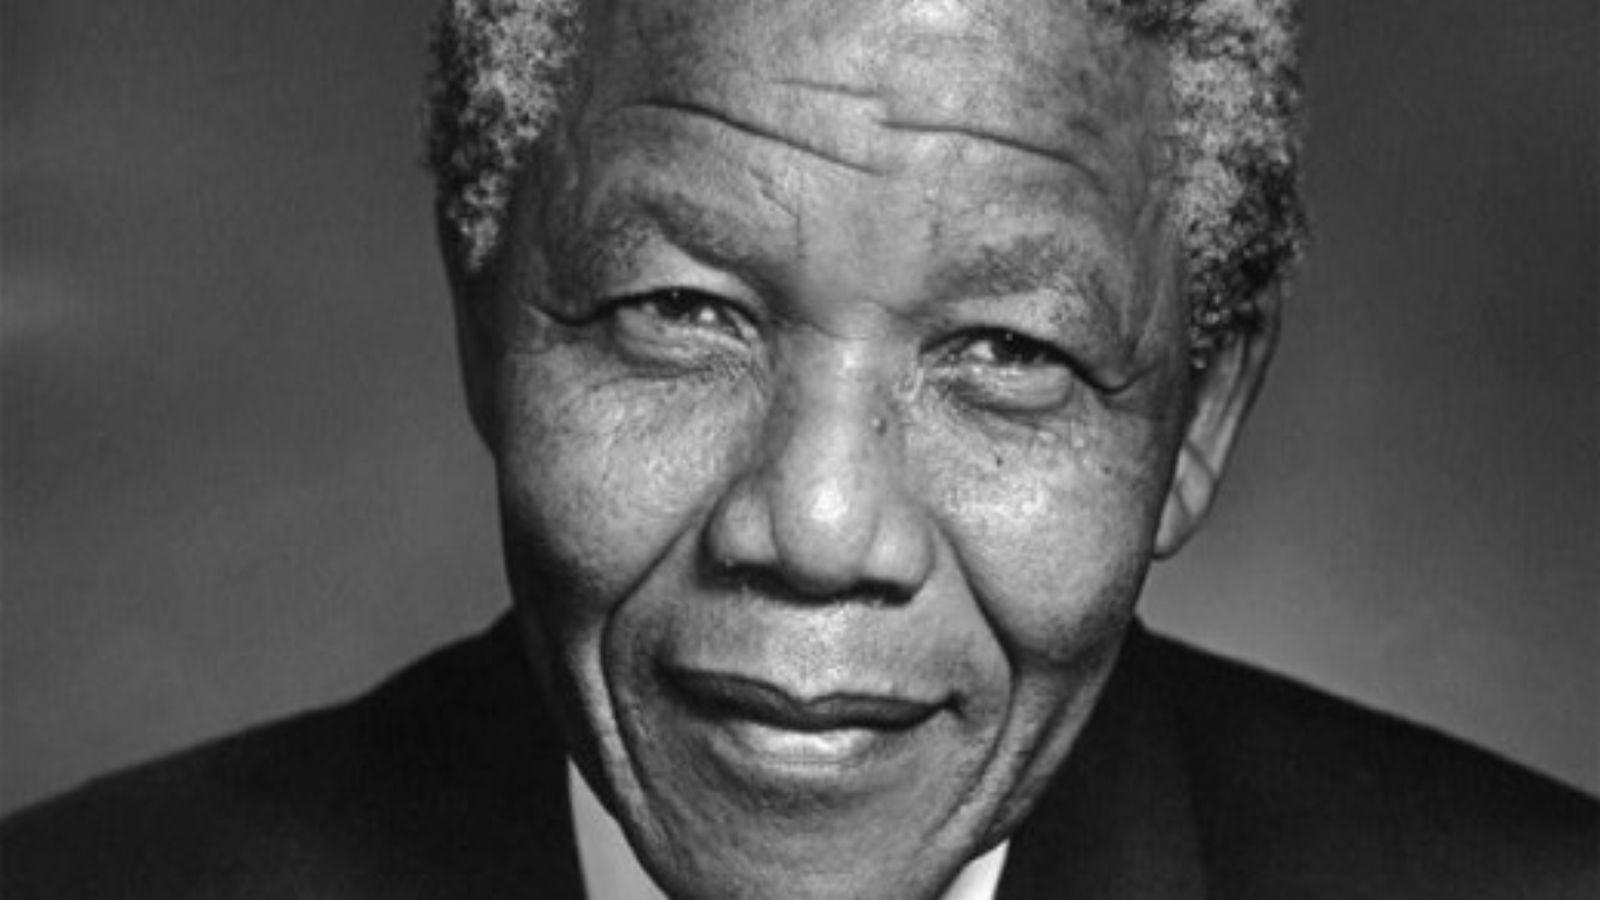 Nelson Mandela, political prisoner and hero of humanity